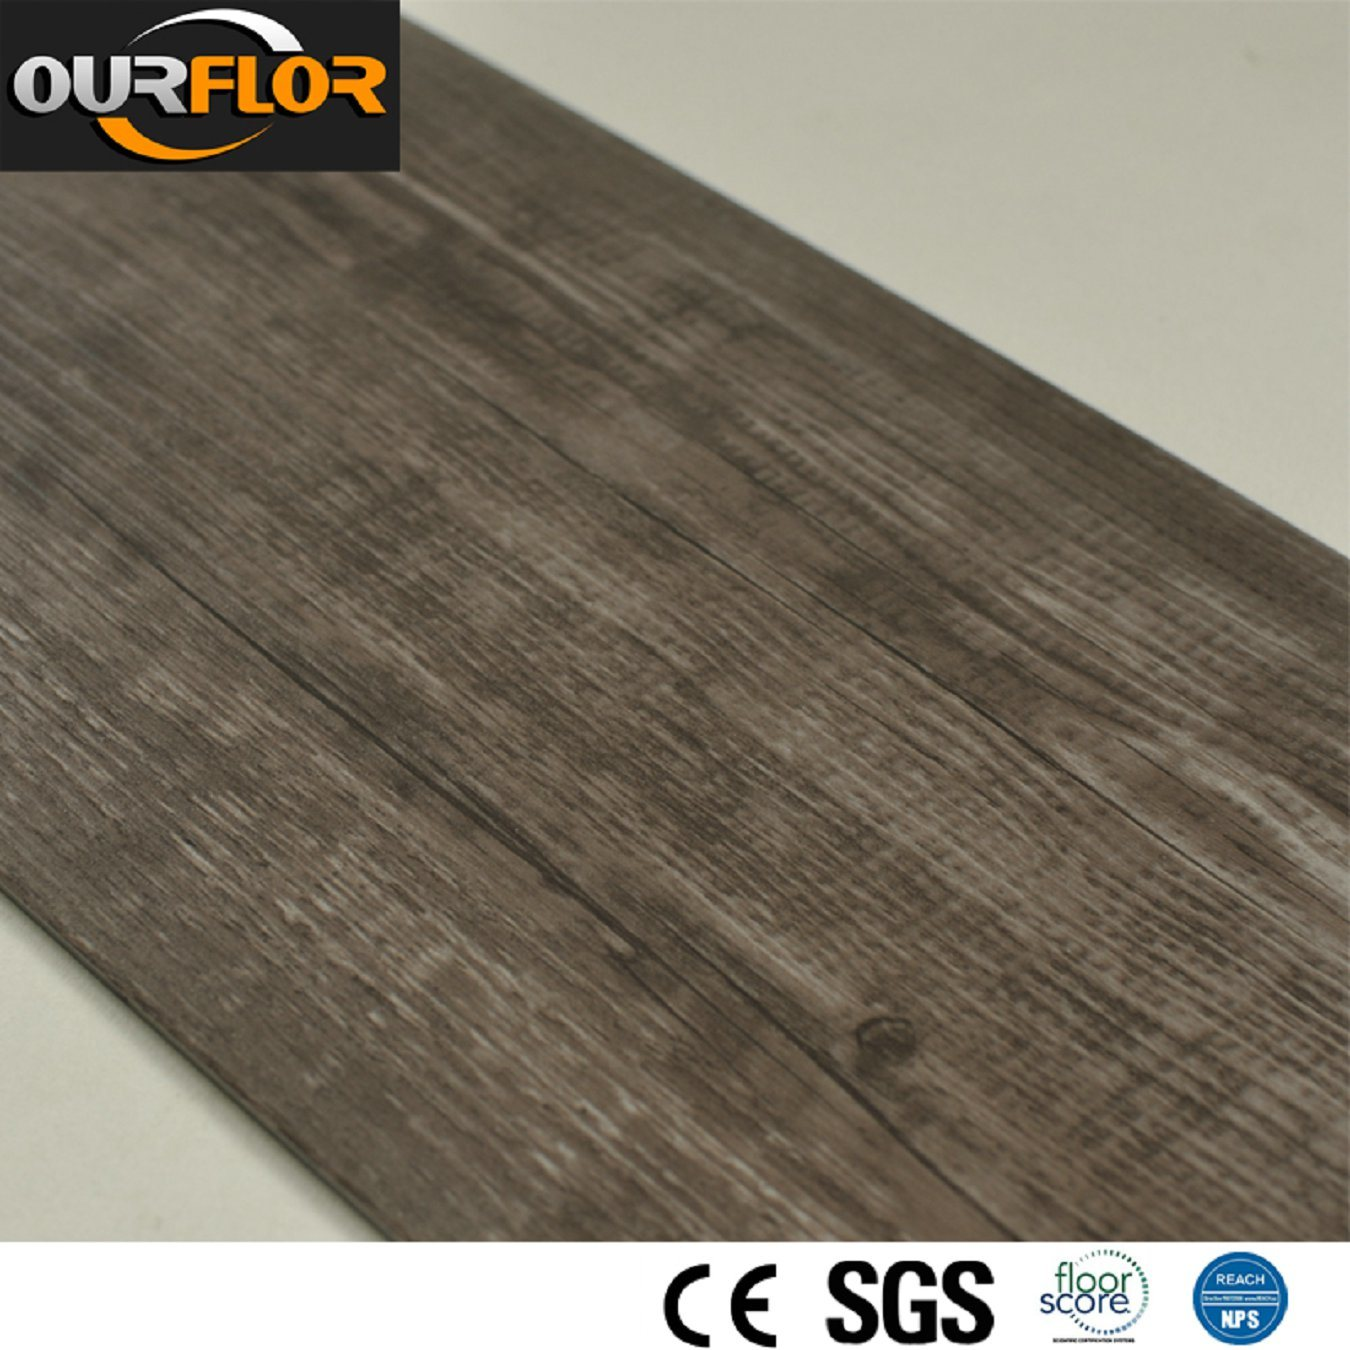 PVC Vinyl Floor Tiles/ PVC Flooring/ Plastic Flooring with Thickness of 2mm, 2.5mm, 3mm